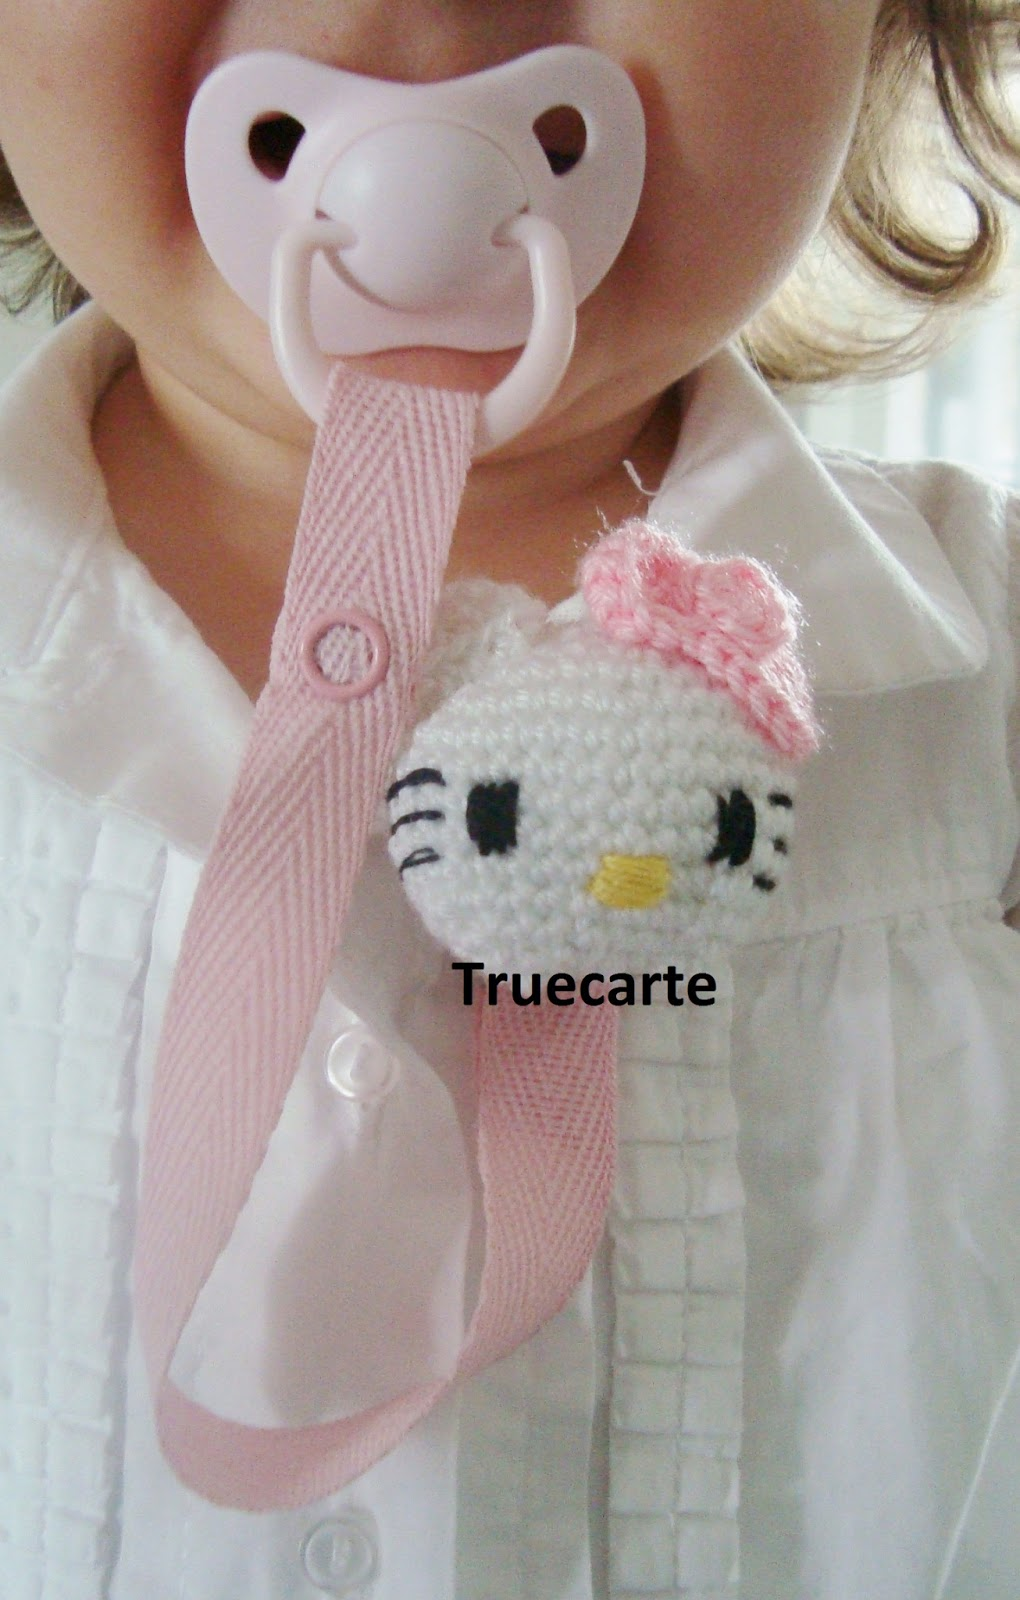 Truecarte: Bebe Truecarte